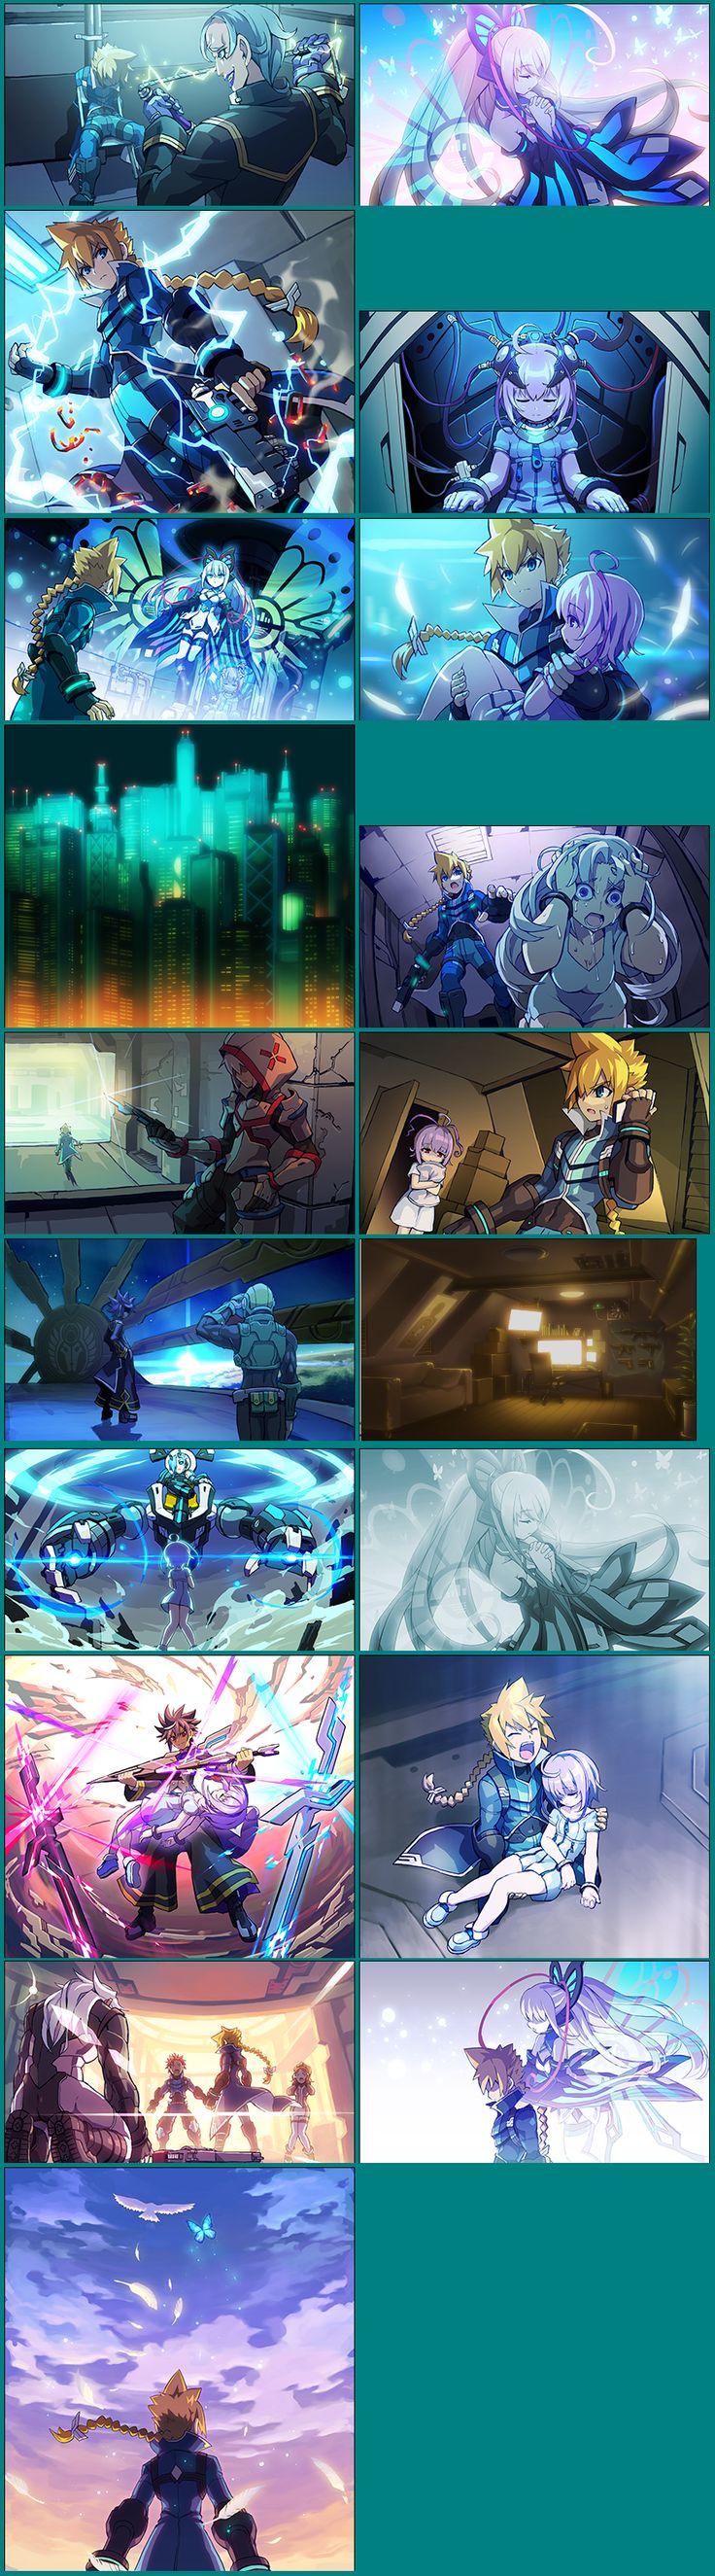 Azure Striker Gunvolt - Story Images